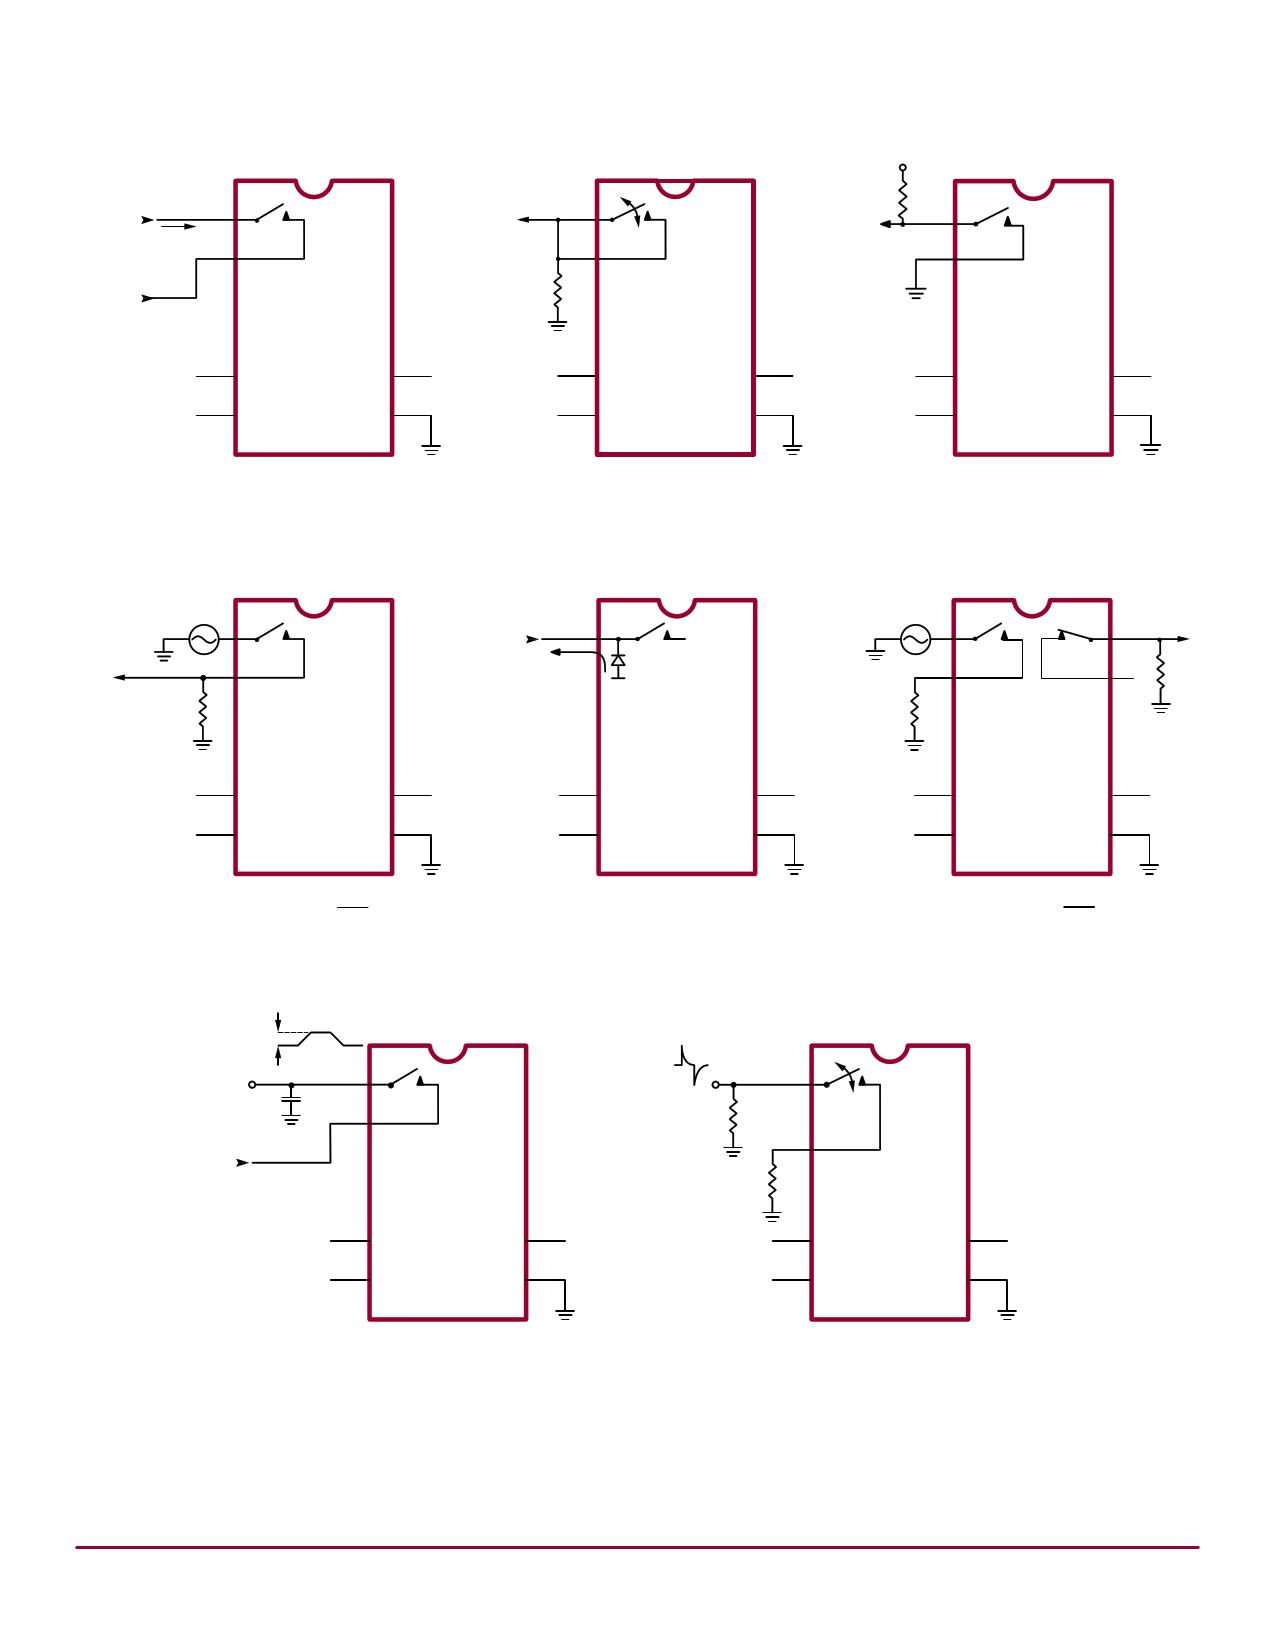 HV20220FG-G 電子部品, 半導体